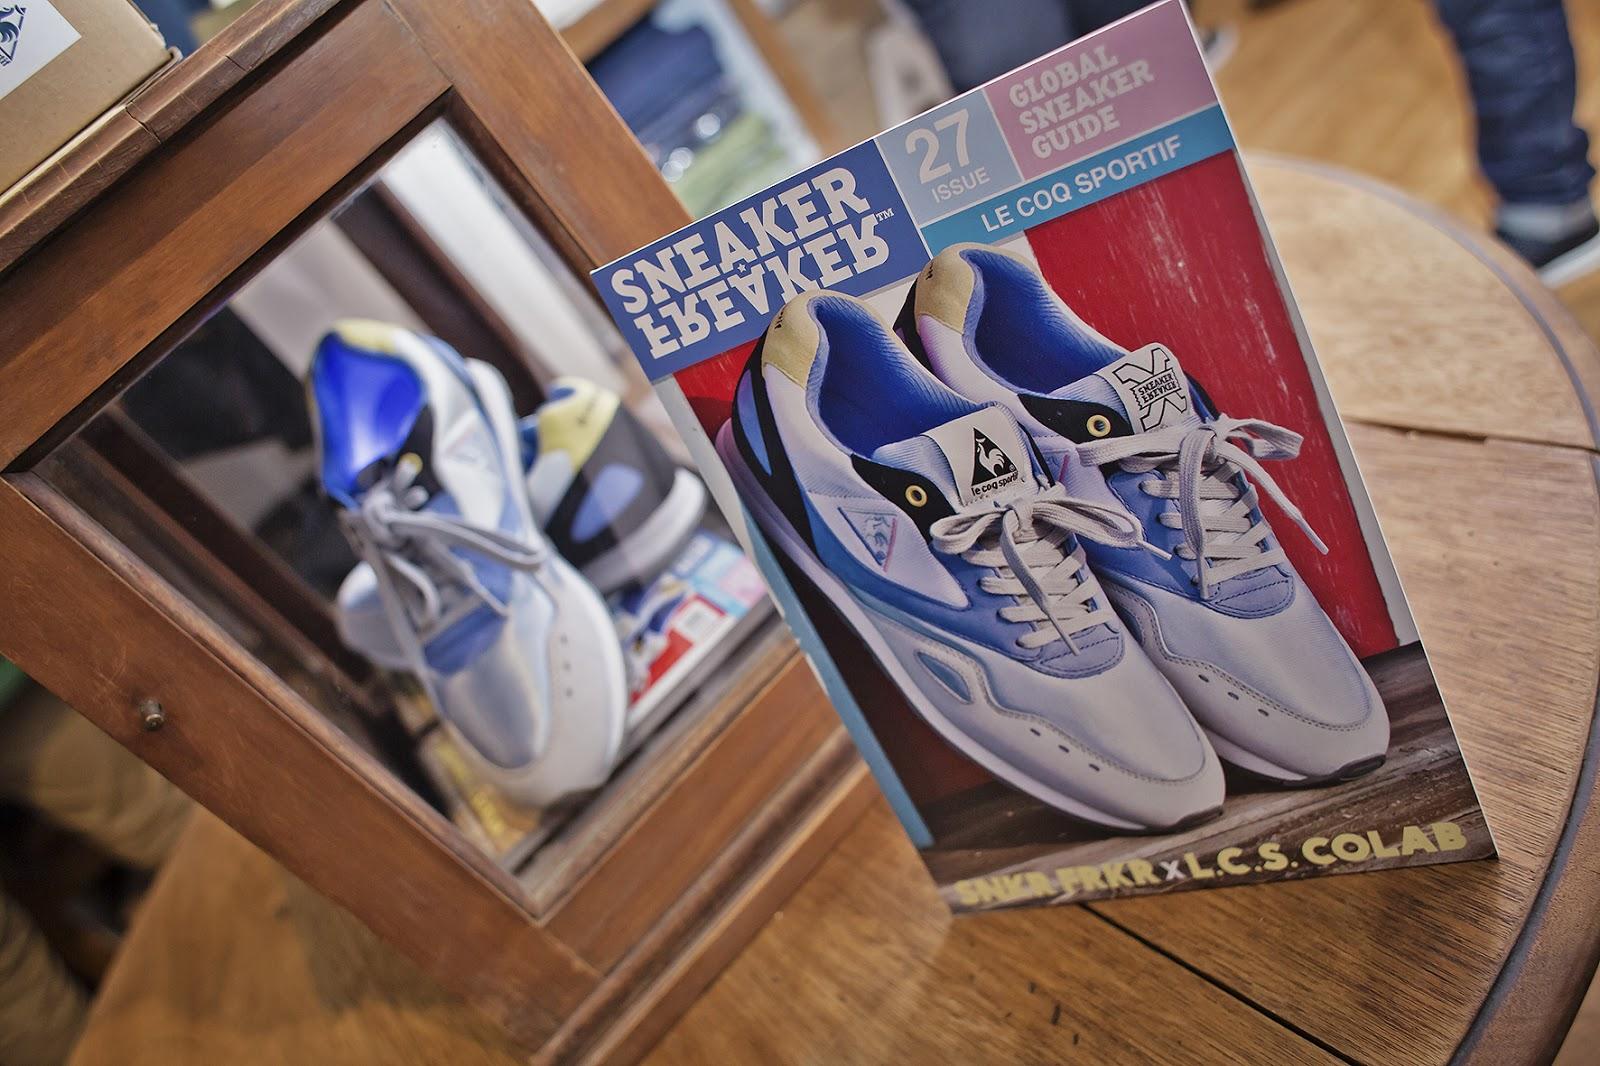 bac40c6059f Sneaker Freaker x Le Coq Sportif Flash Launch